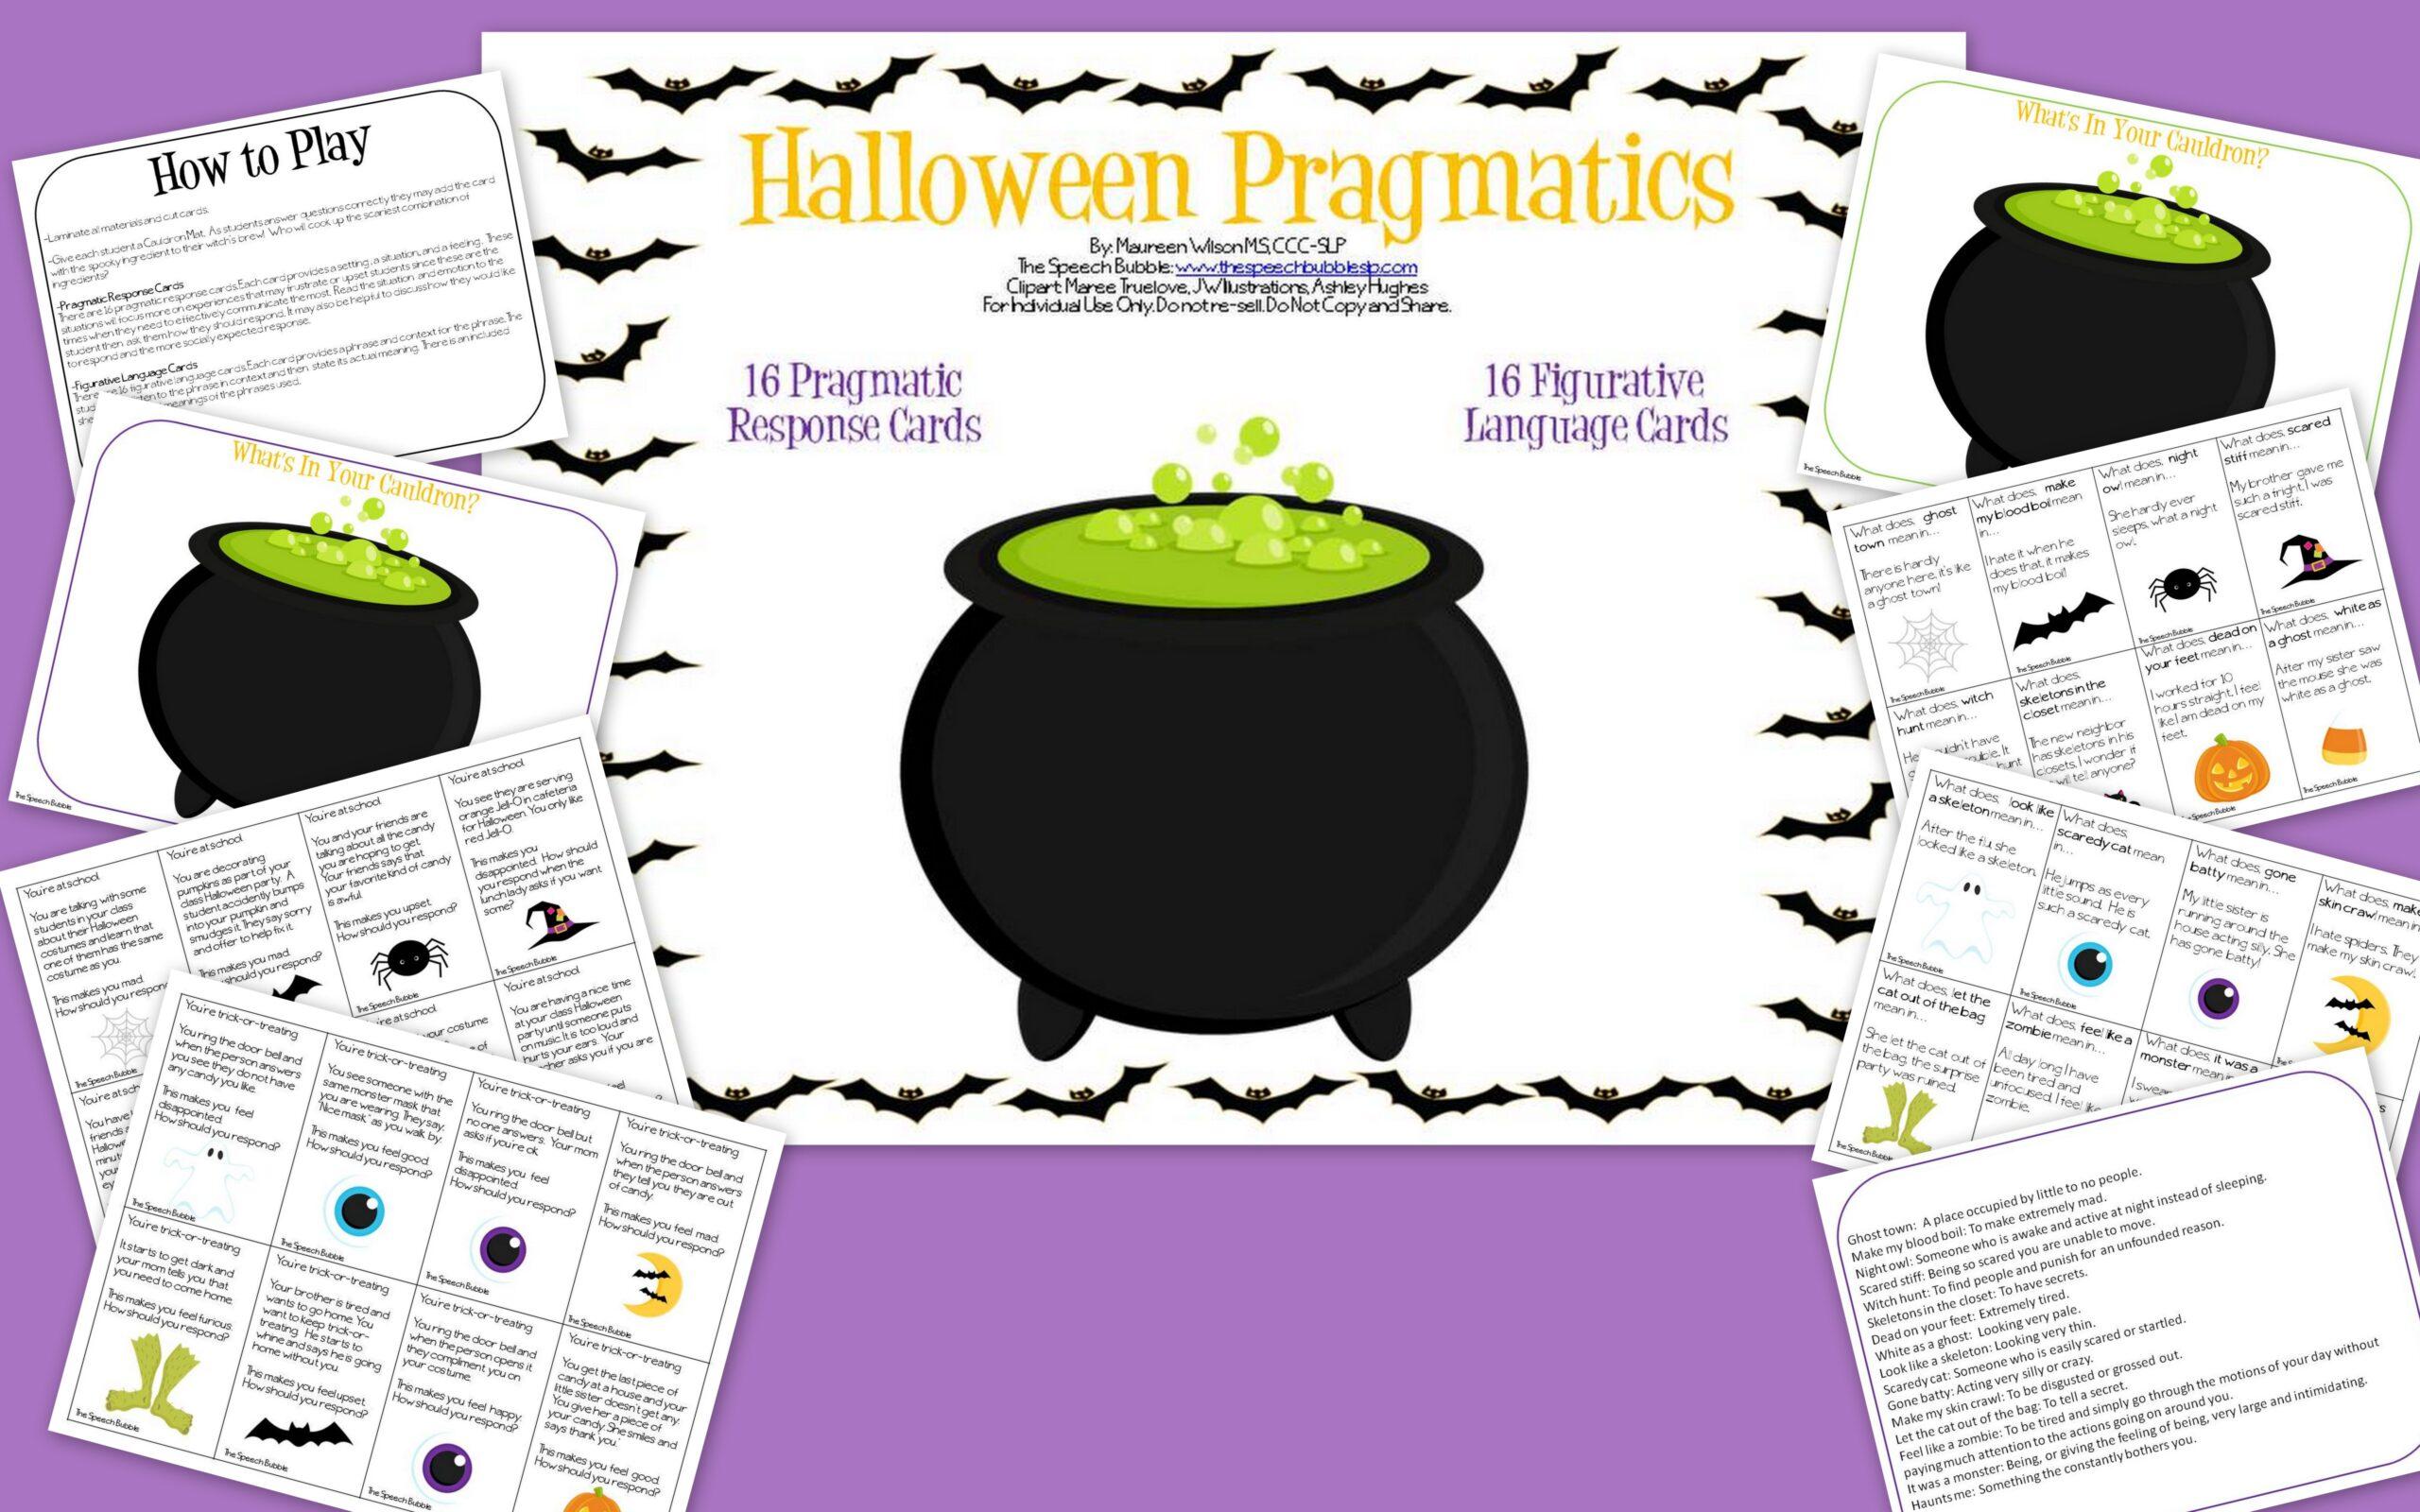 Halloween Pragmatics (and Other Spooky Speech Activities)